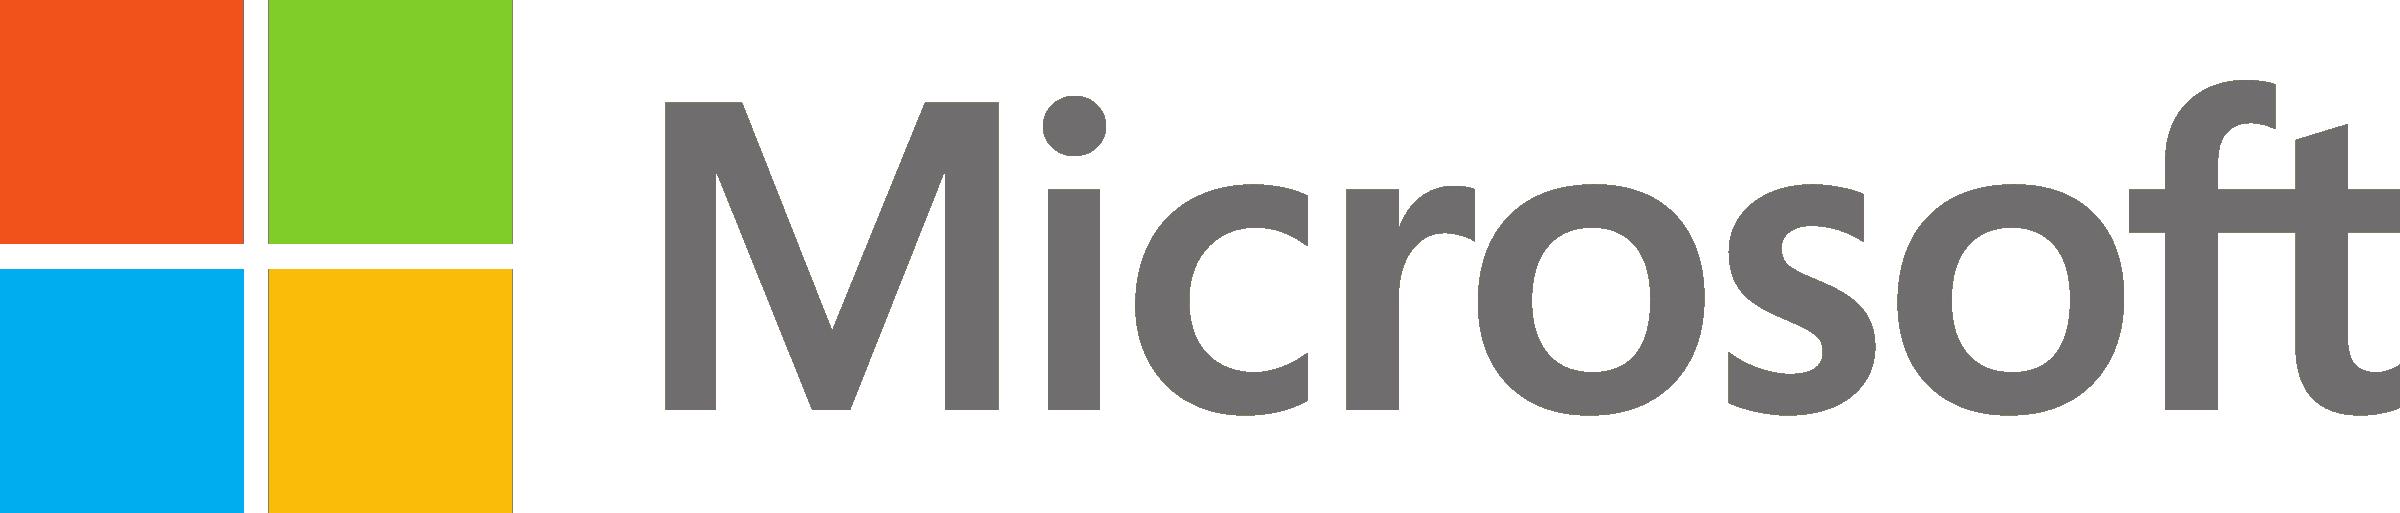 microsoft-logo-png-transparent (1)